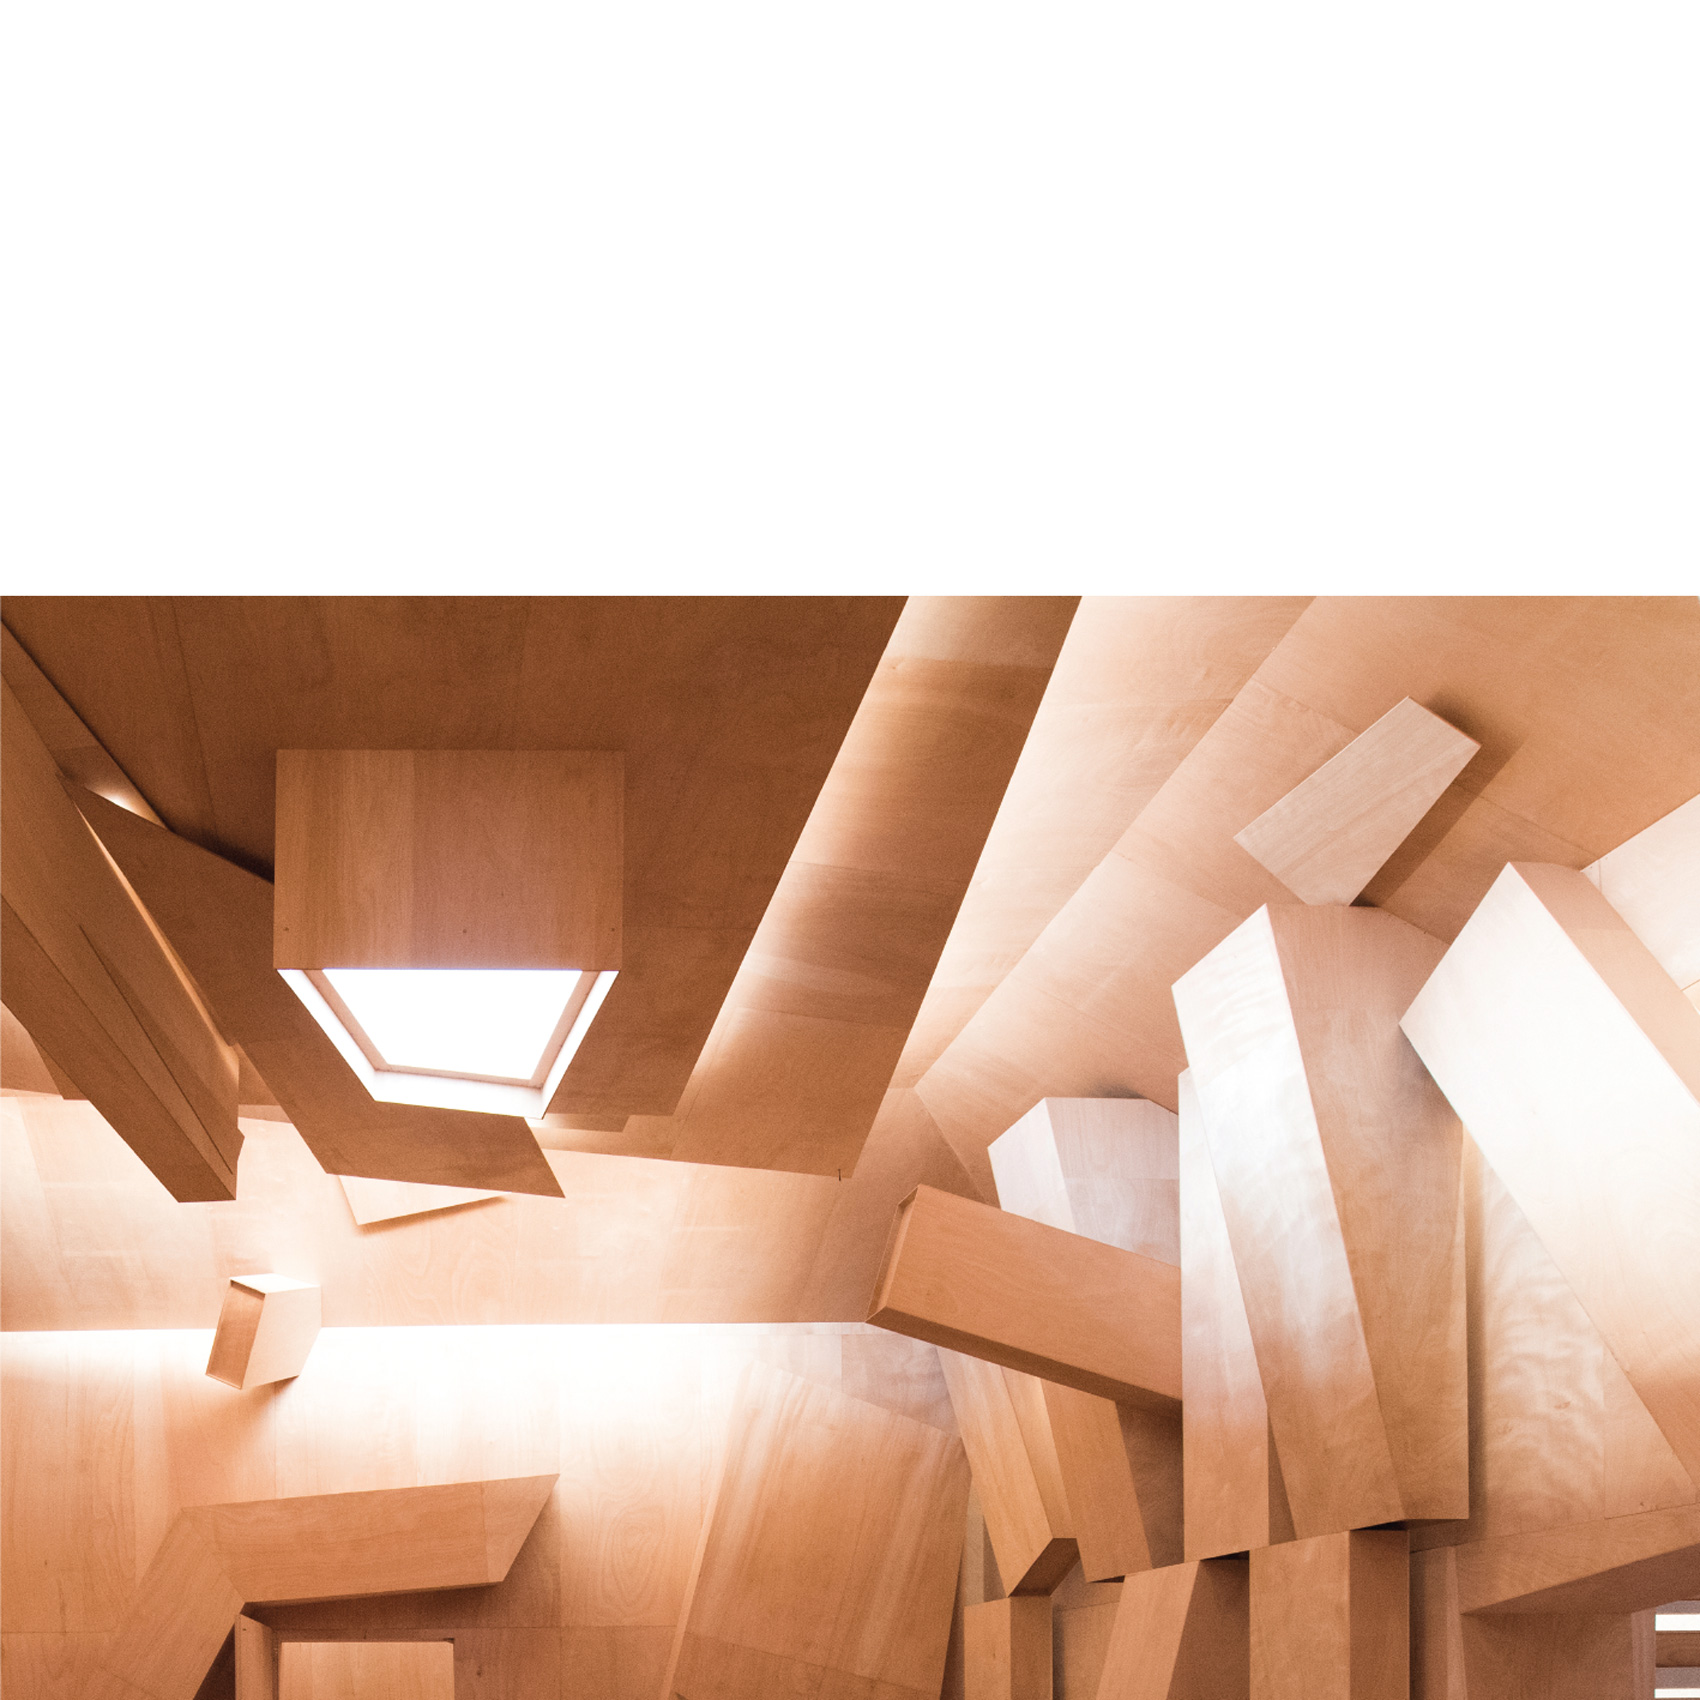 Nicola Di Croce – Affective Room Tones